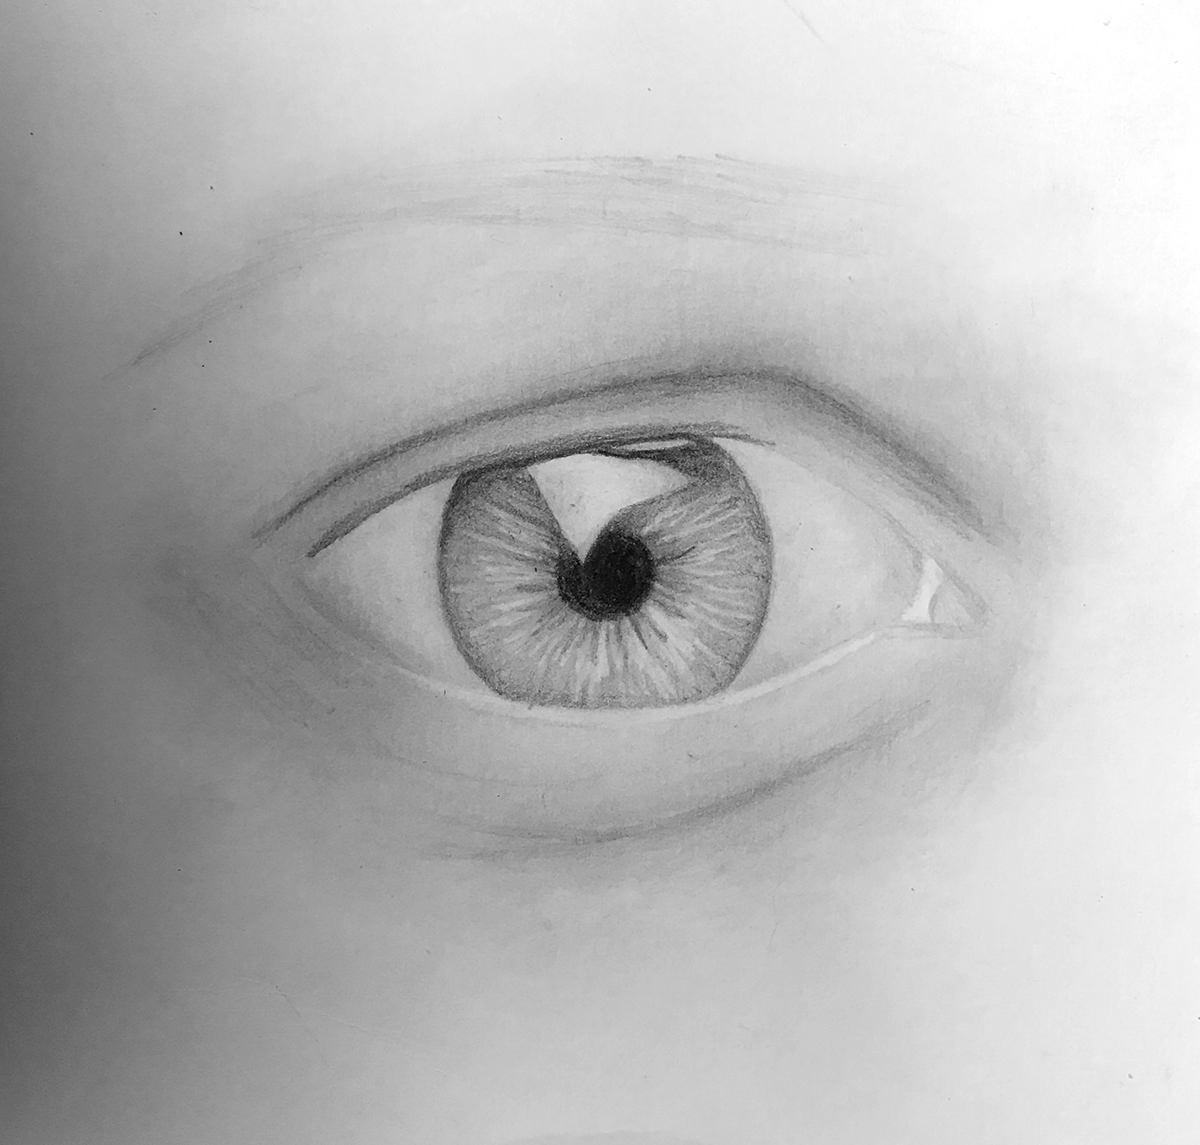 draw-a-realistic-eye-step-05-fill-in-areas.jpg